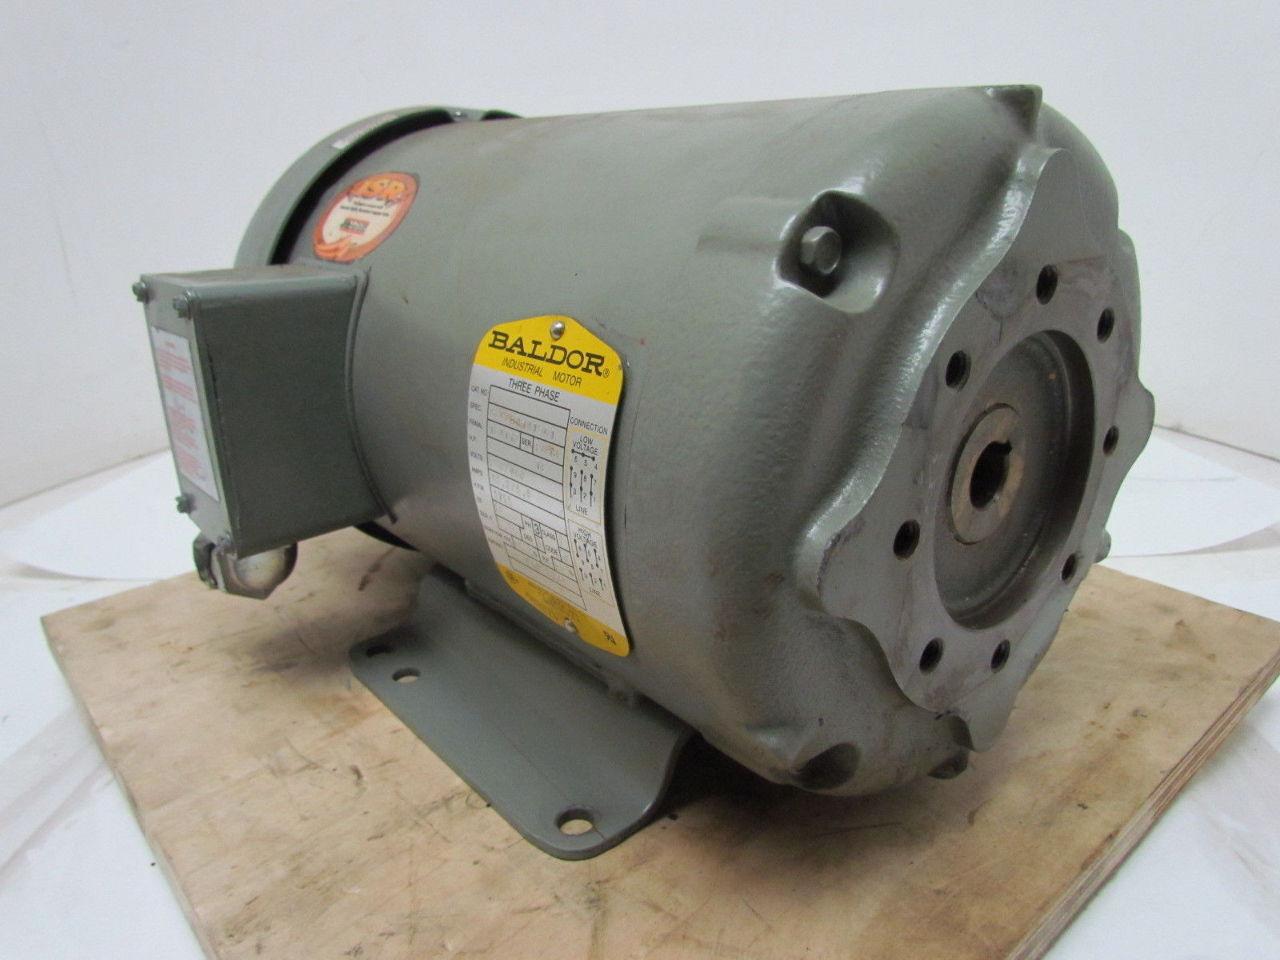 Baldor F898 5 Hp 260 460v 1725 Rpm 3 Ph Electric Motor